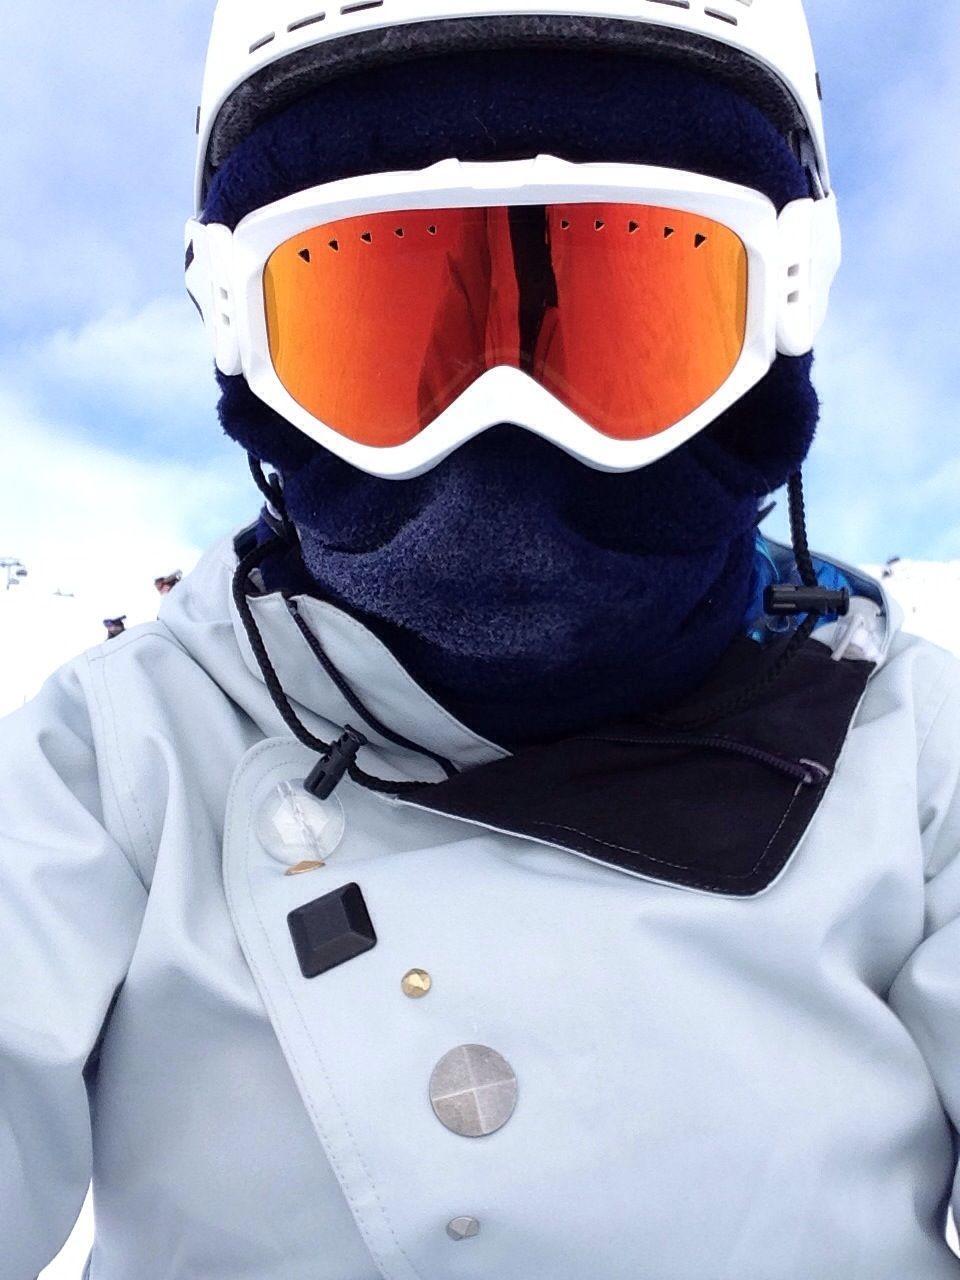 fa14aecee8d Snowboarding Style in the Swiss Alps - Women s Snowboarding Apparel  featuring Oakley